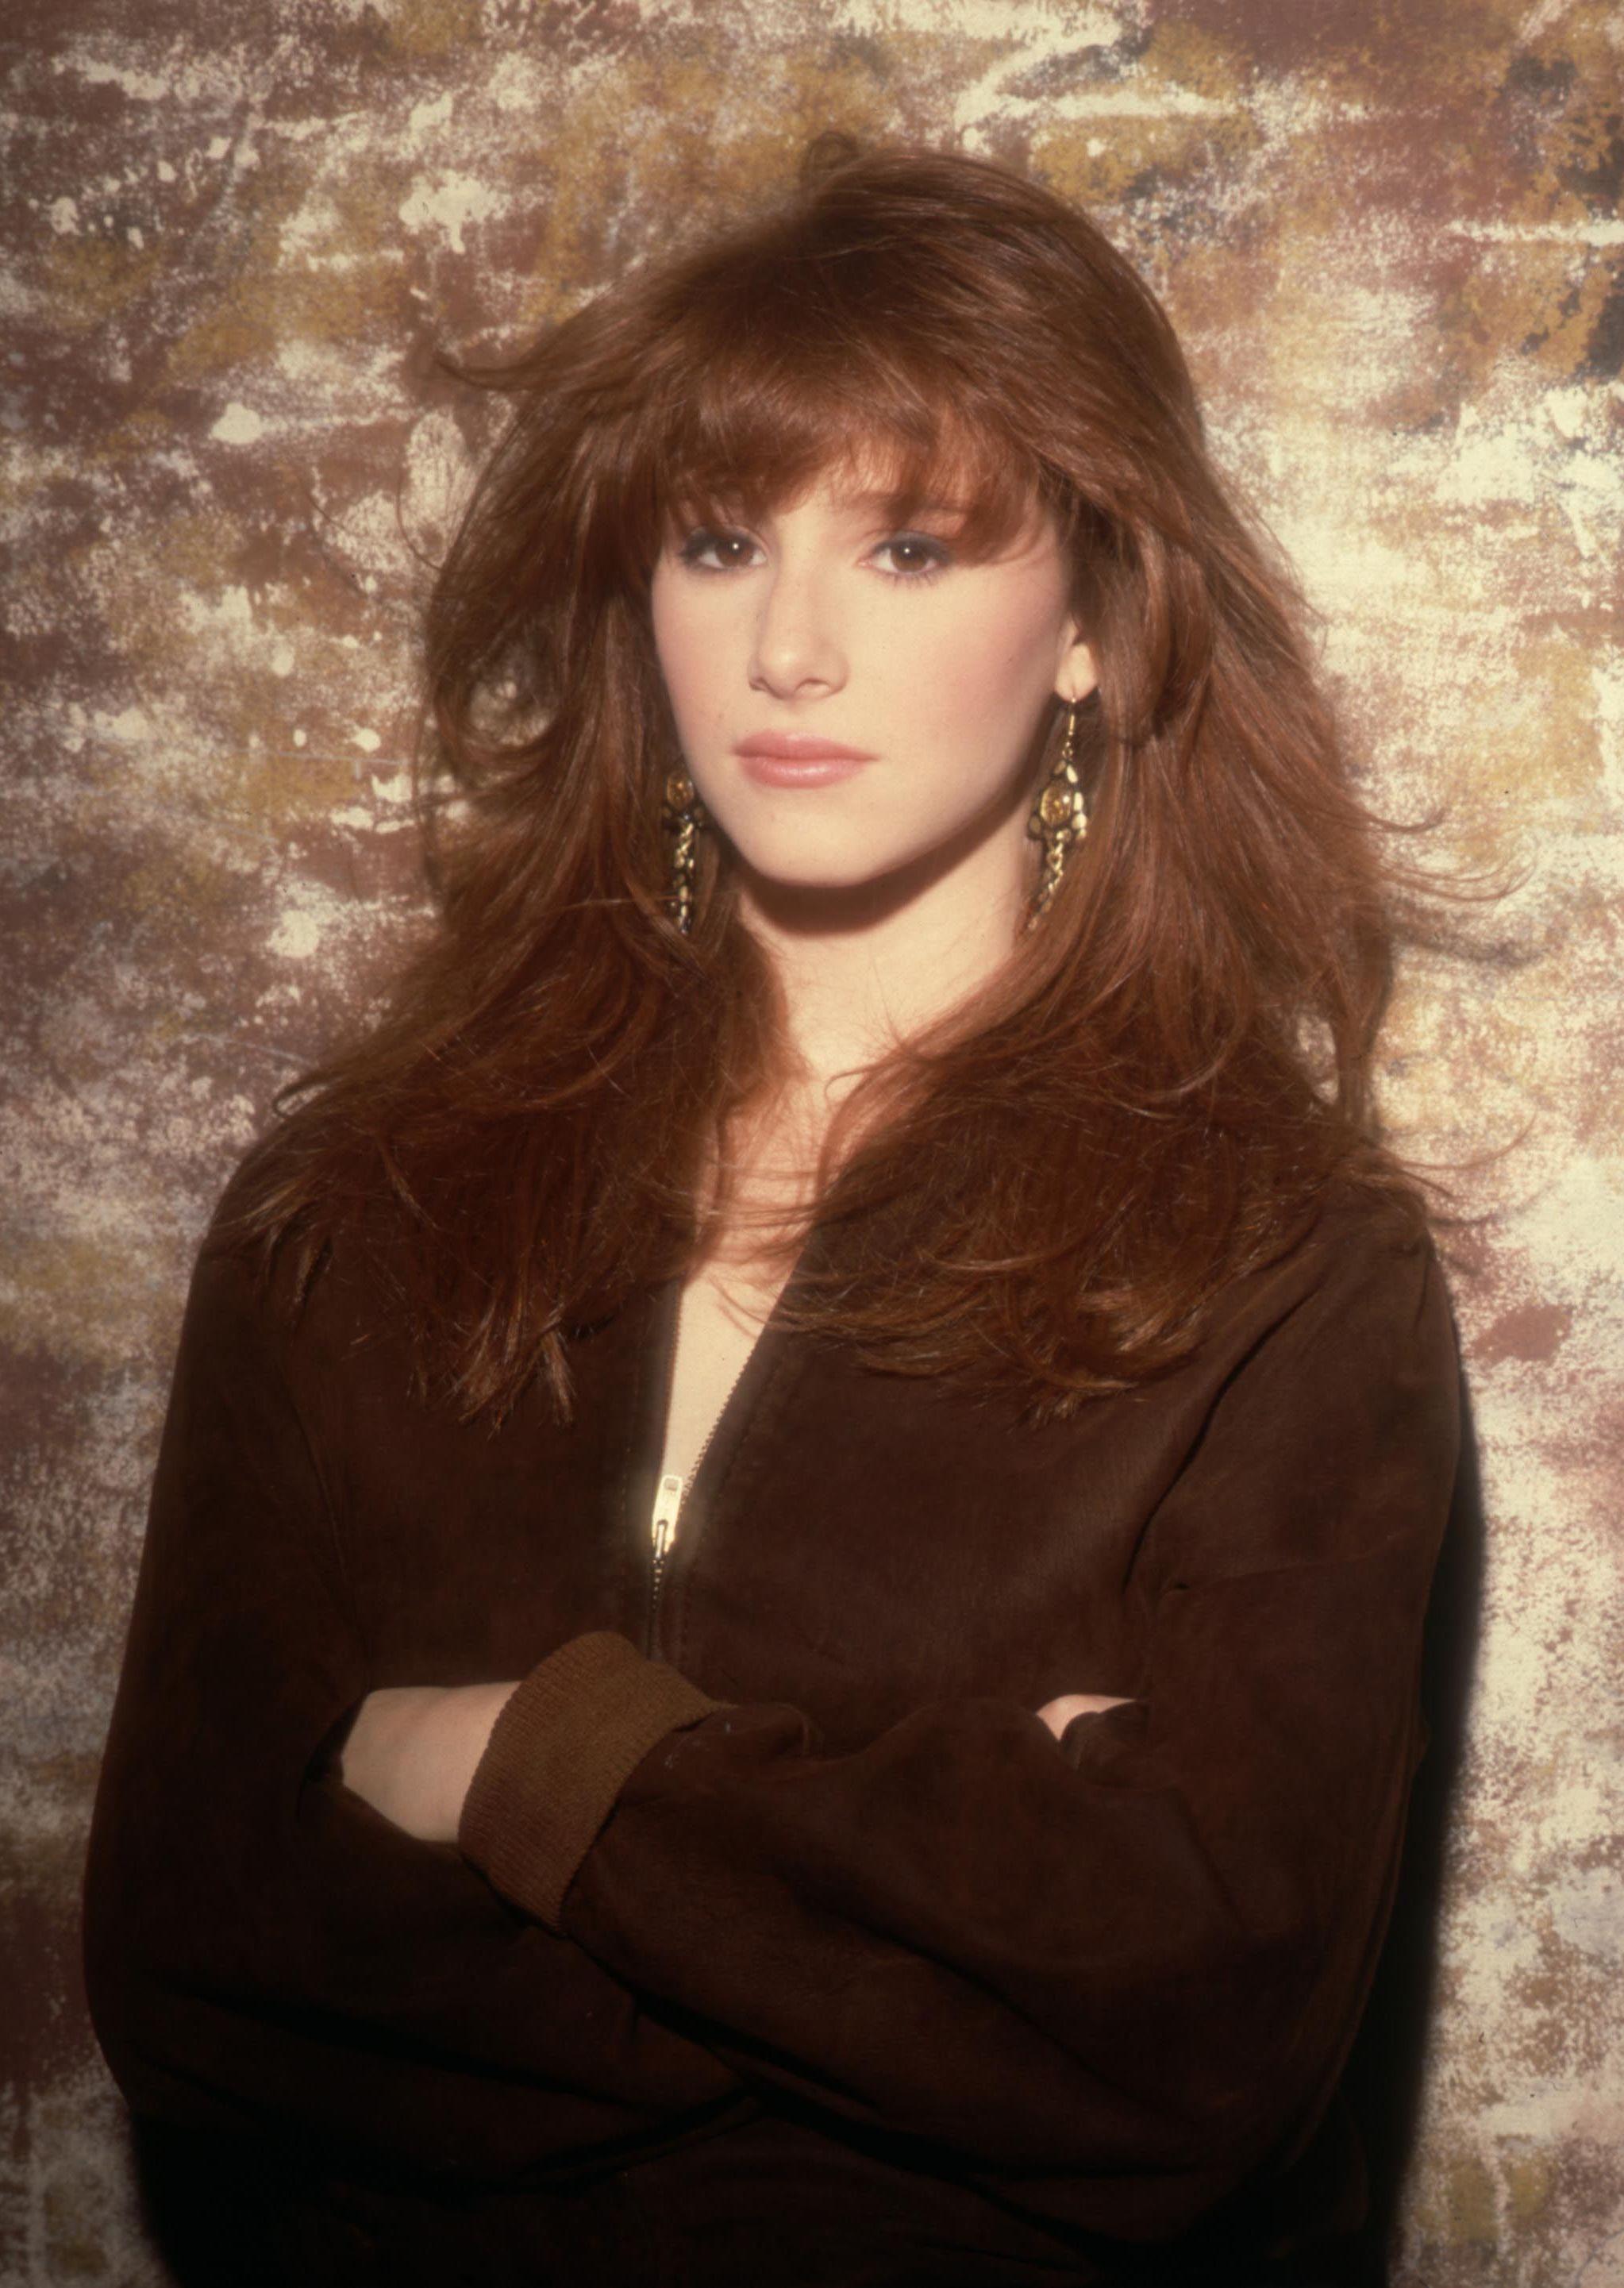 Singer Tiffany posing in 1988